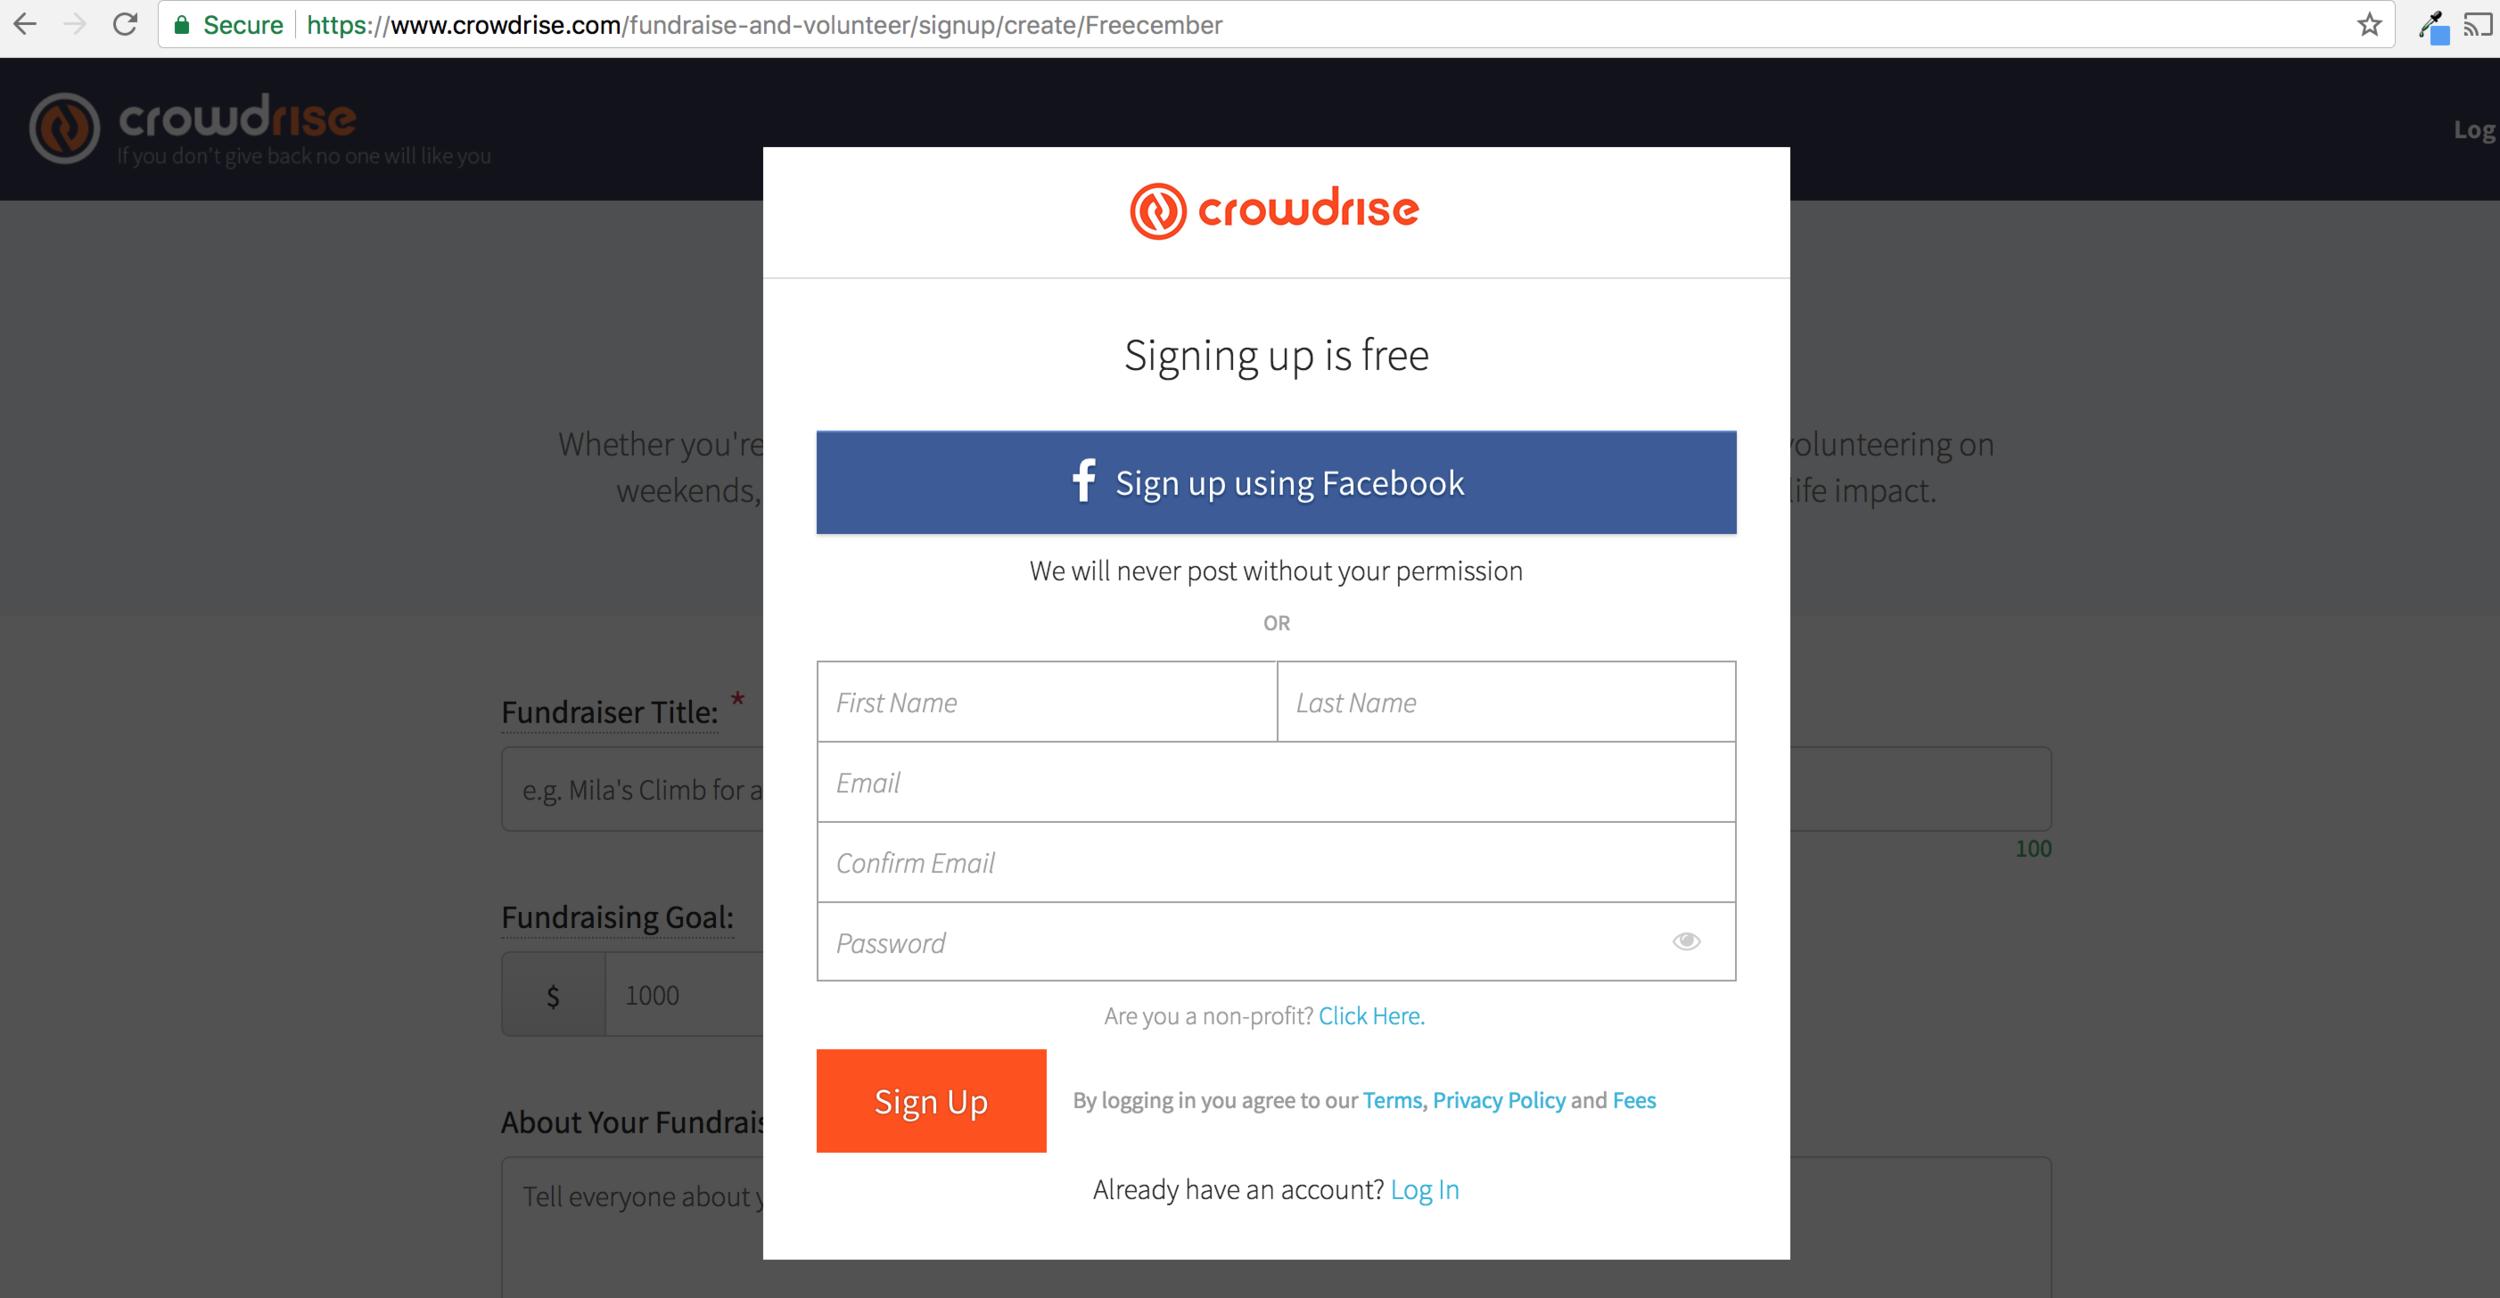 Freecember Set Up Team Crowdrise 2.png